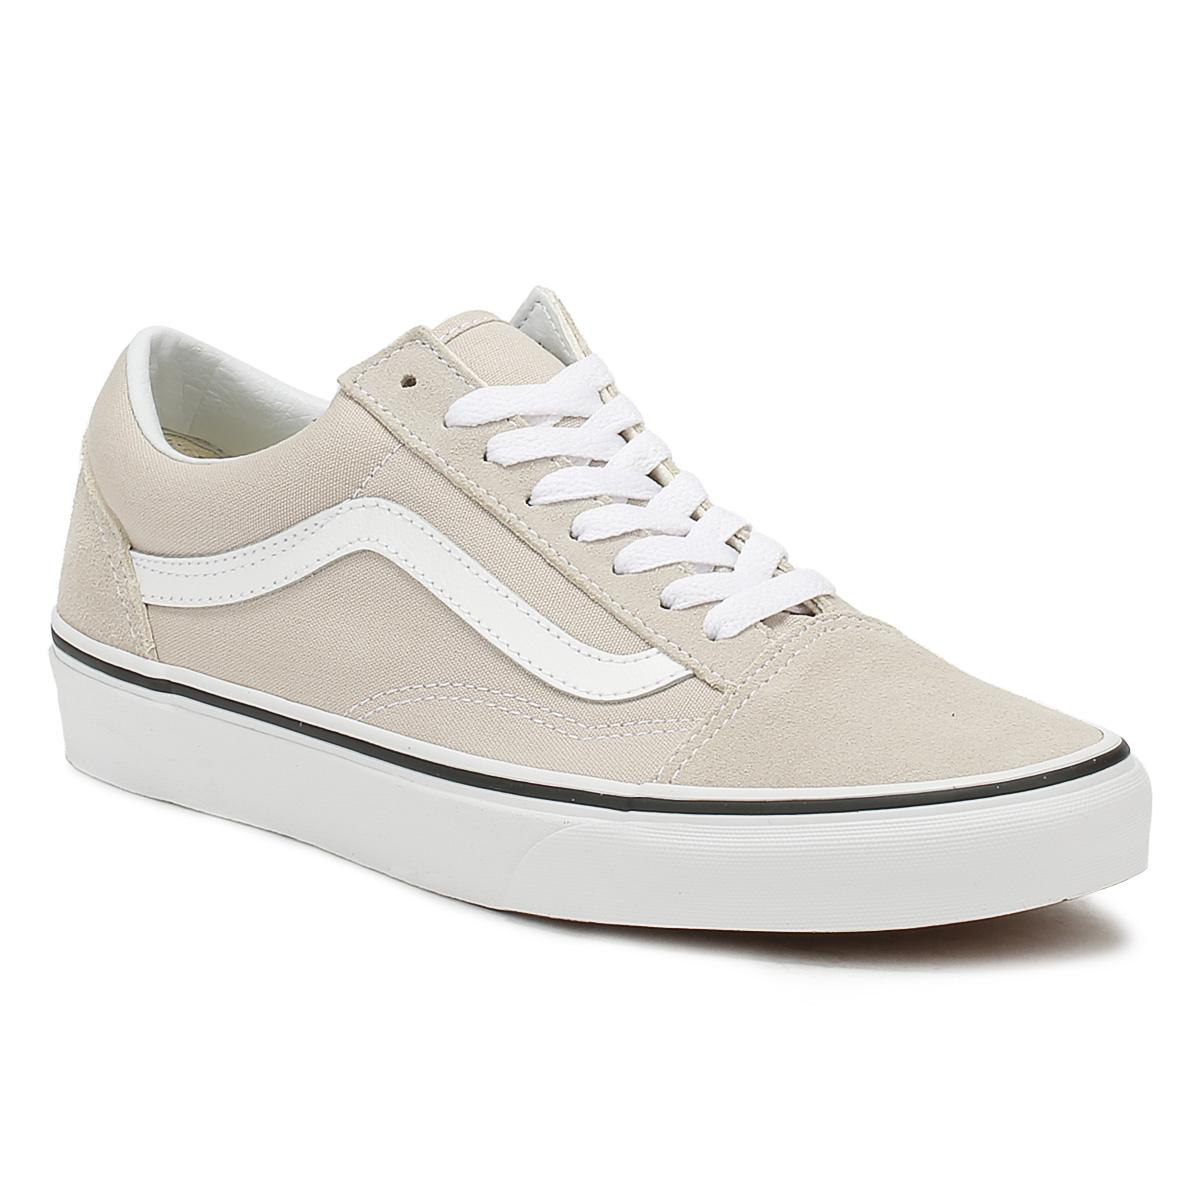 Vans Vans Vans Unisex Plata Lining & True Blanco Old Skool Trainers Lace Up Skate Zapatos 35d2a8